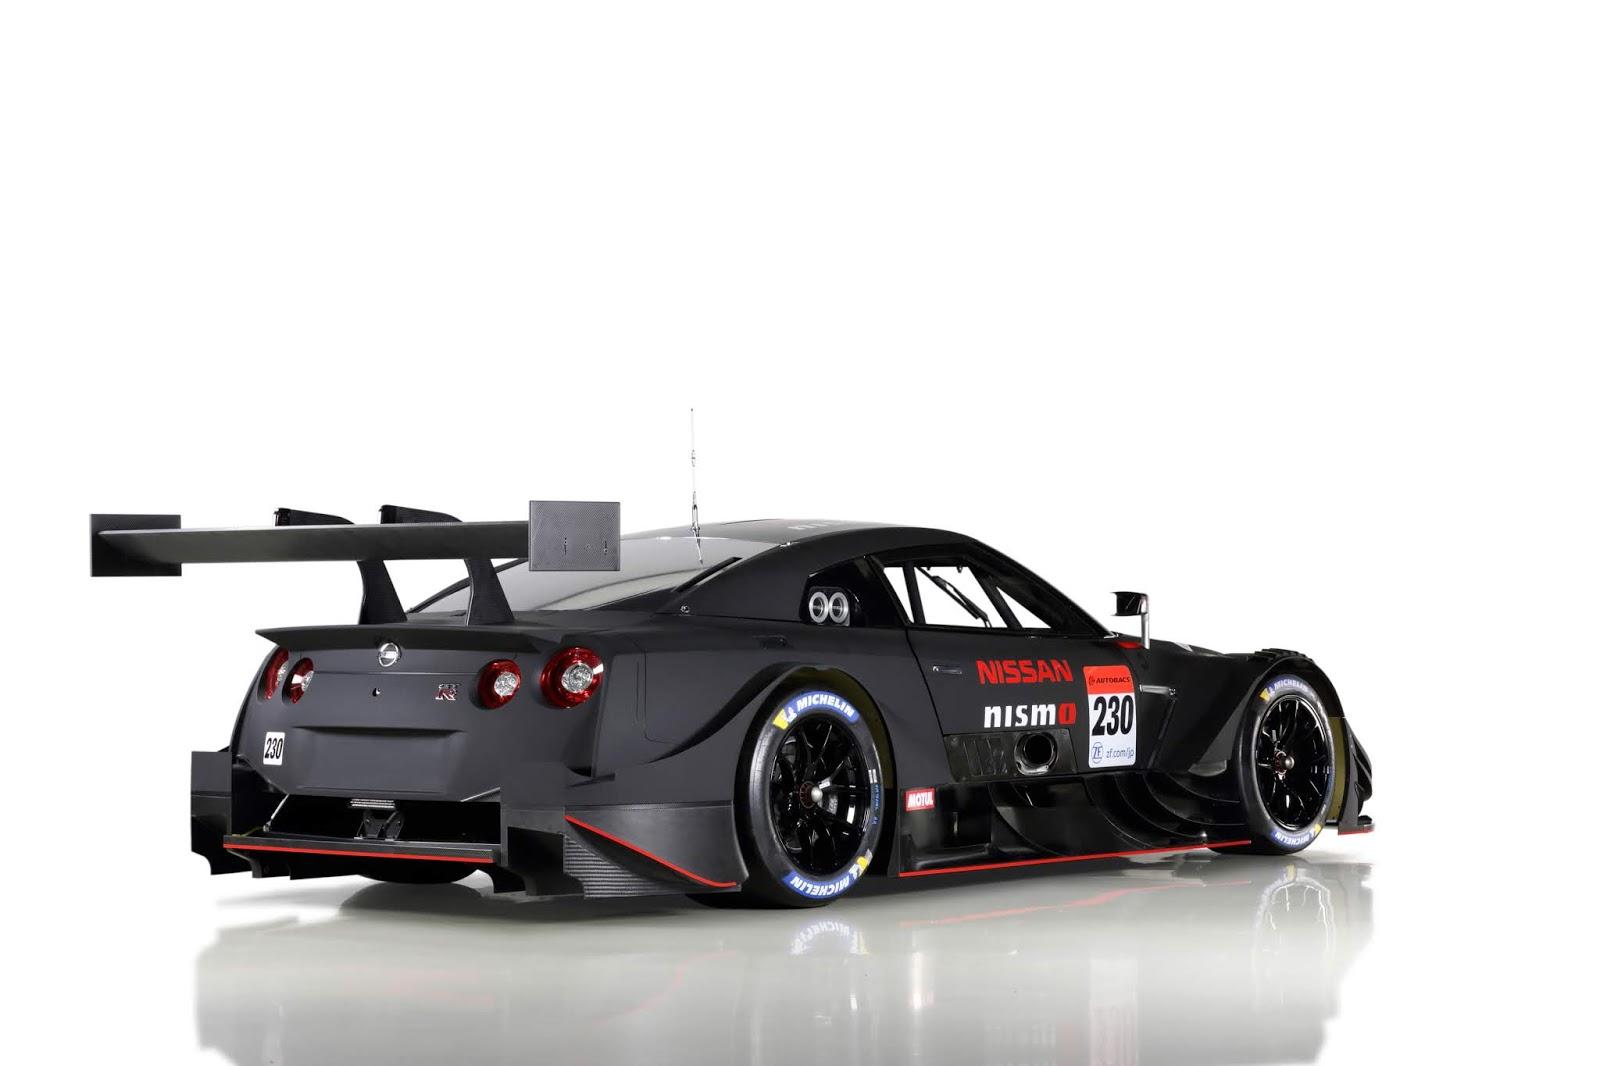 GTR2BNISMO2BGT5002B1 Ιδού το νέο Nissan GT-R Nismo GT500! Nismo, Nismo GT-R, Nissan, Nissan GT-R NISMO, Nissan GT-R NISMO GT500, zblog